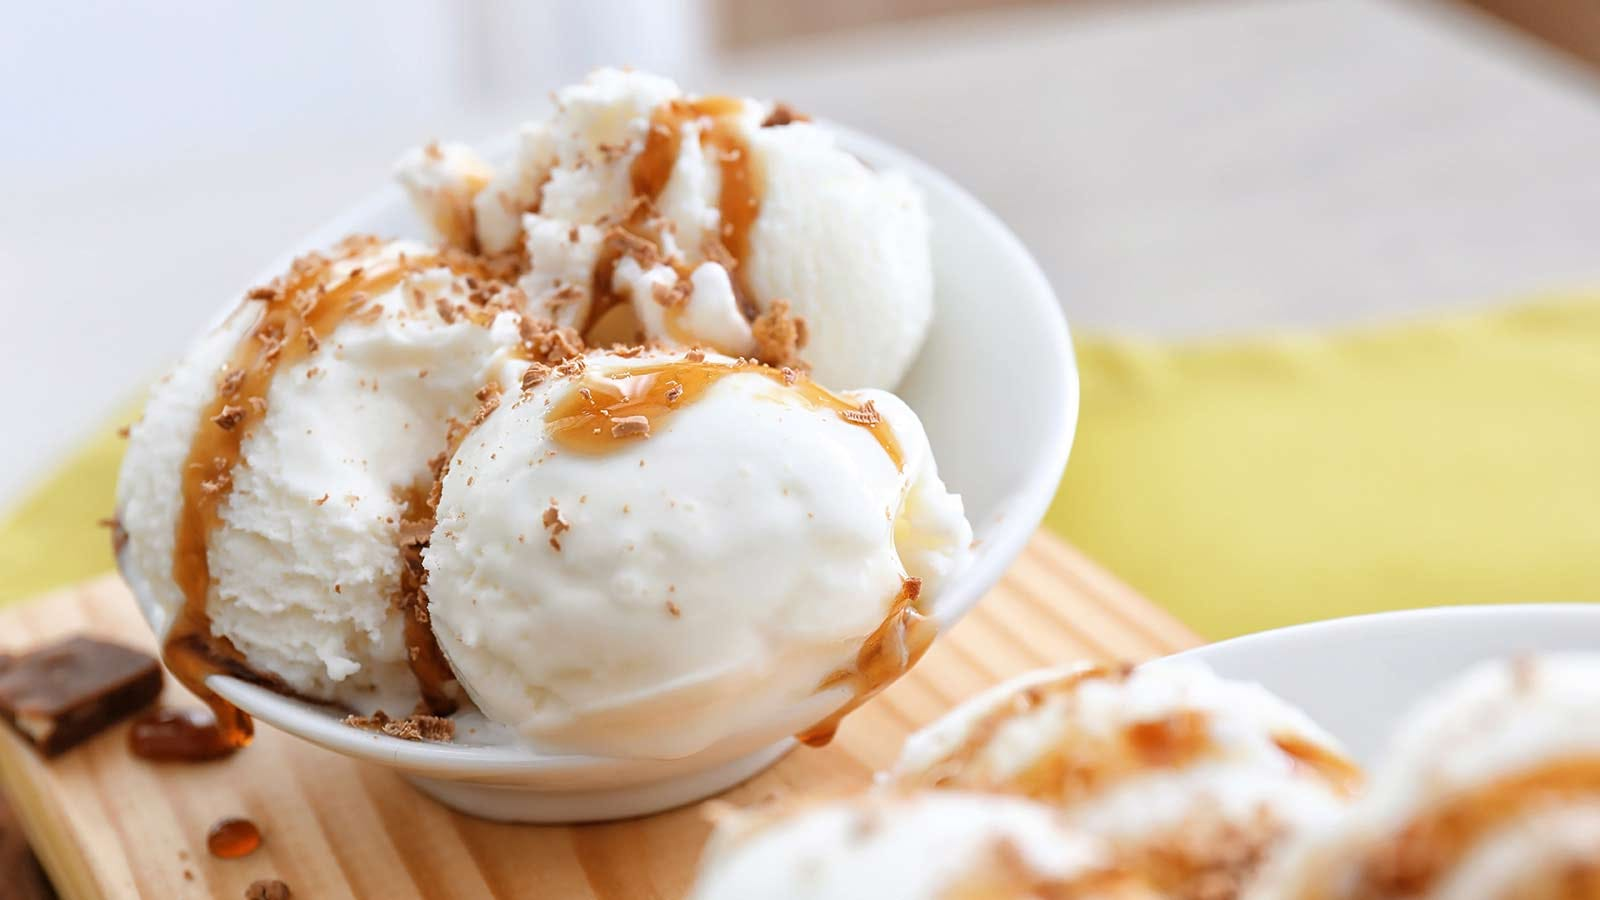 Vanilla ice cream, striped with caramel on top.